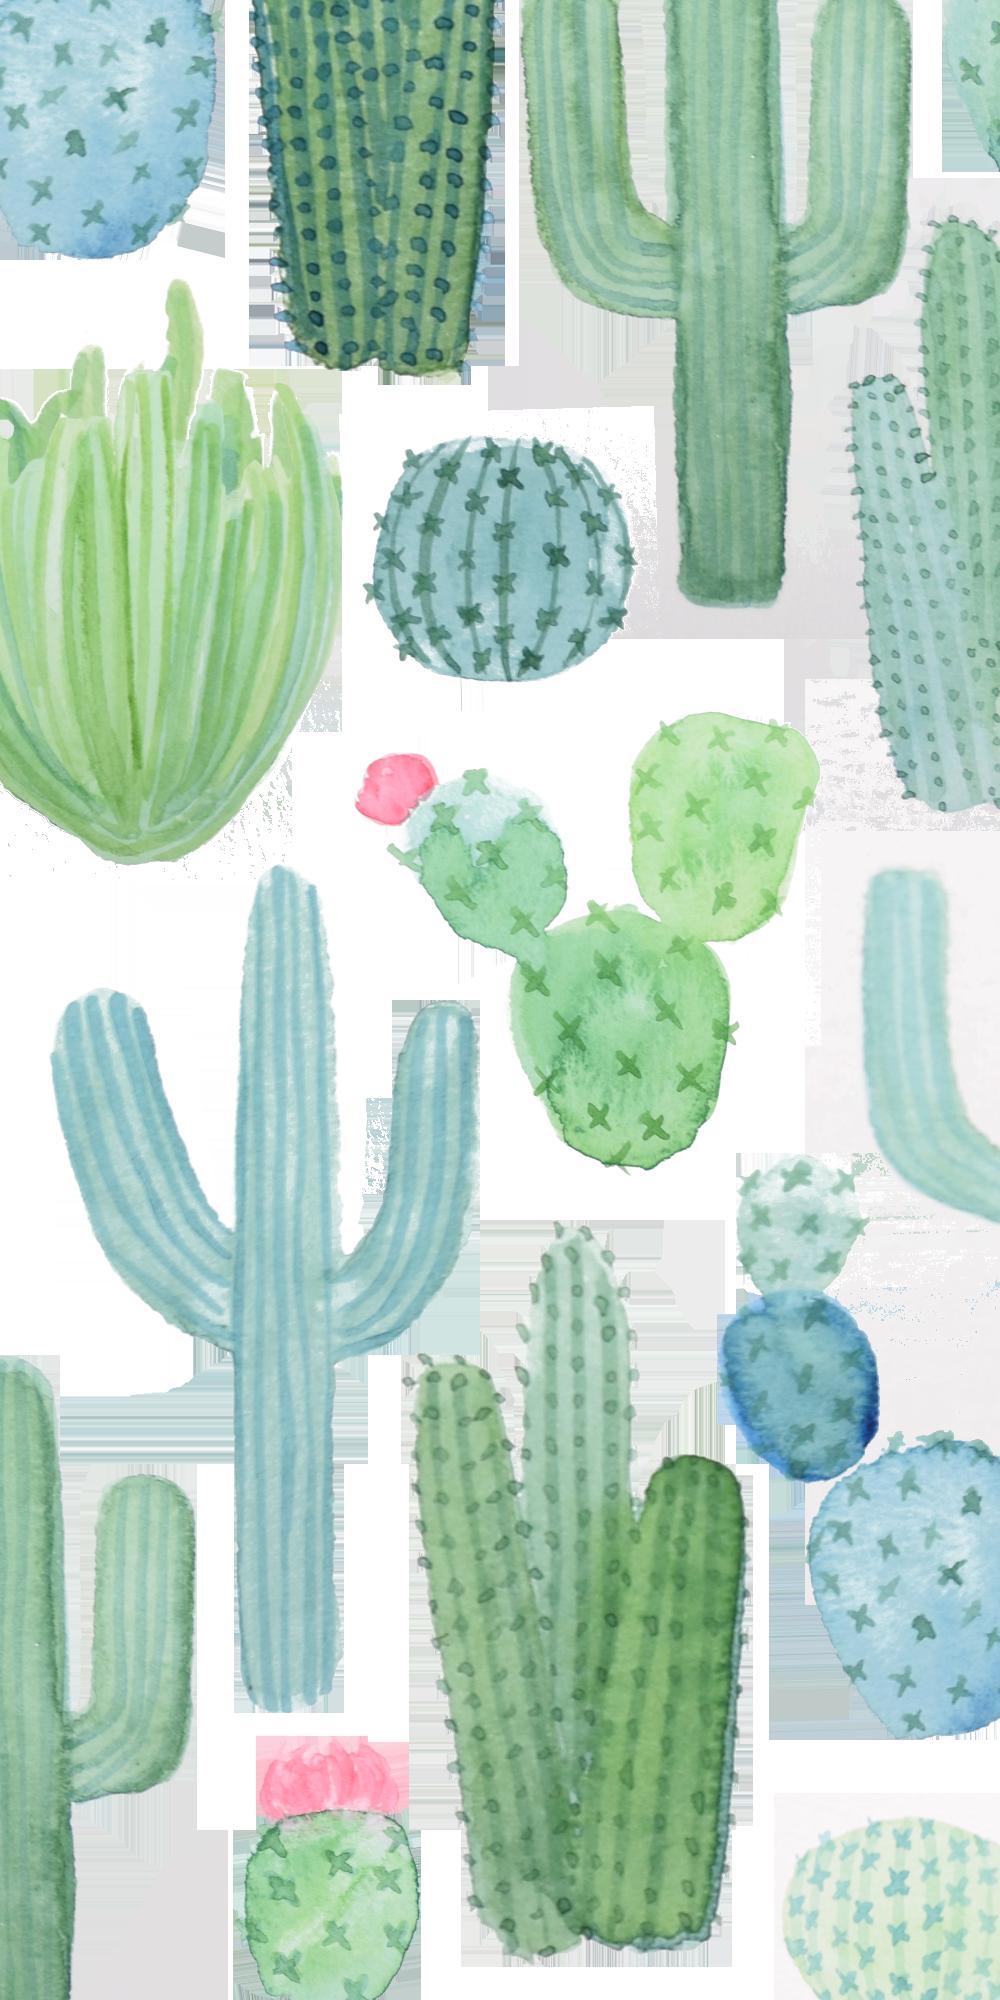 on sale 6fcd8 d6406 Glitter iPhone XS Case - Desert Cactus Garden // Watercolor Cacti in ...